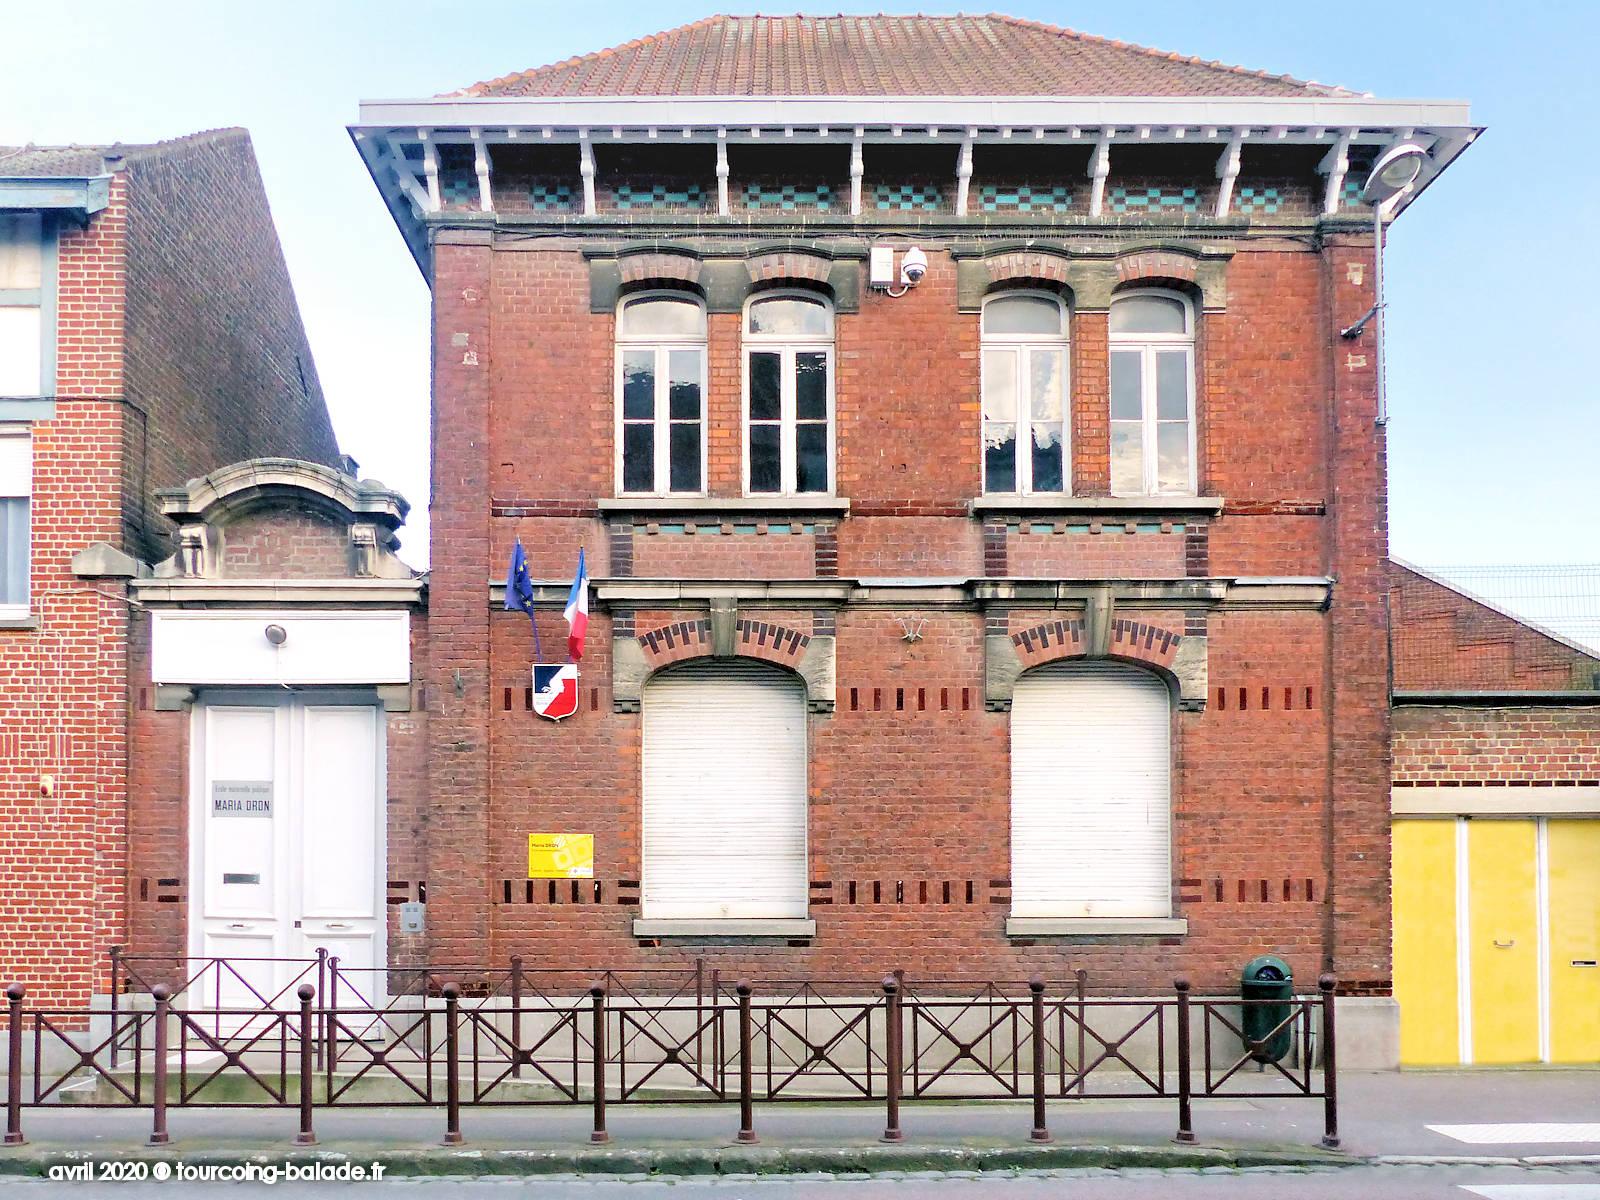 École Maternelle Maria Dron, Tourcoing, 2020